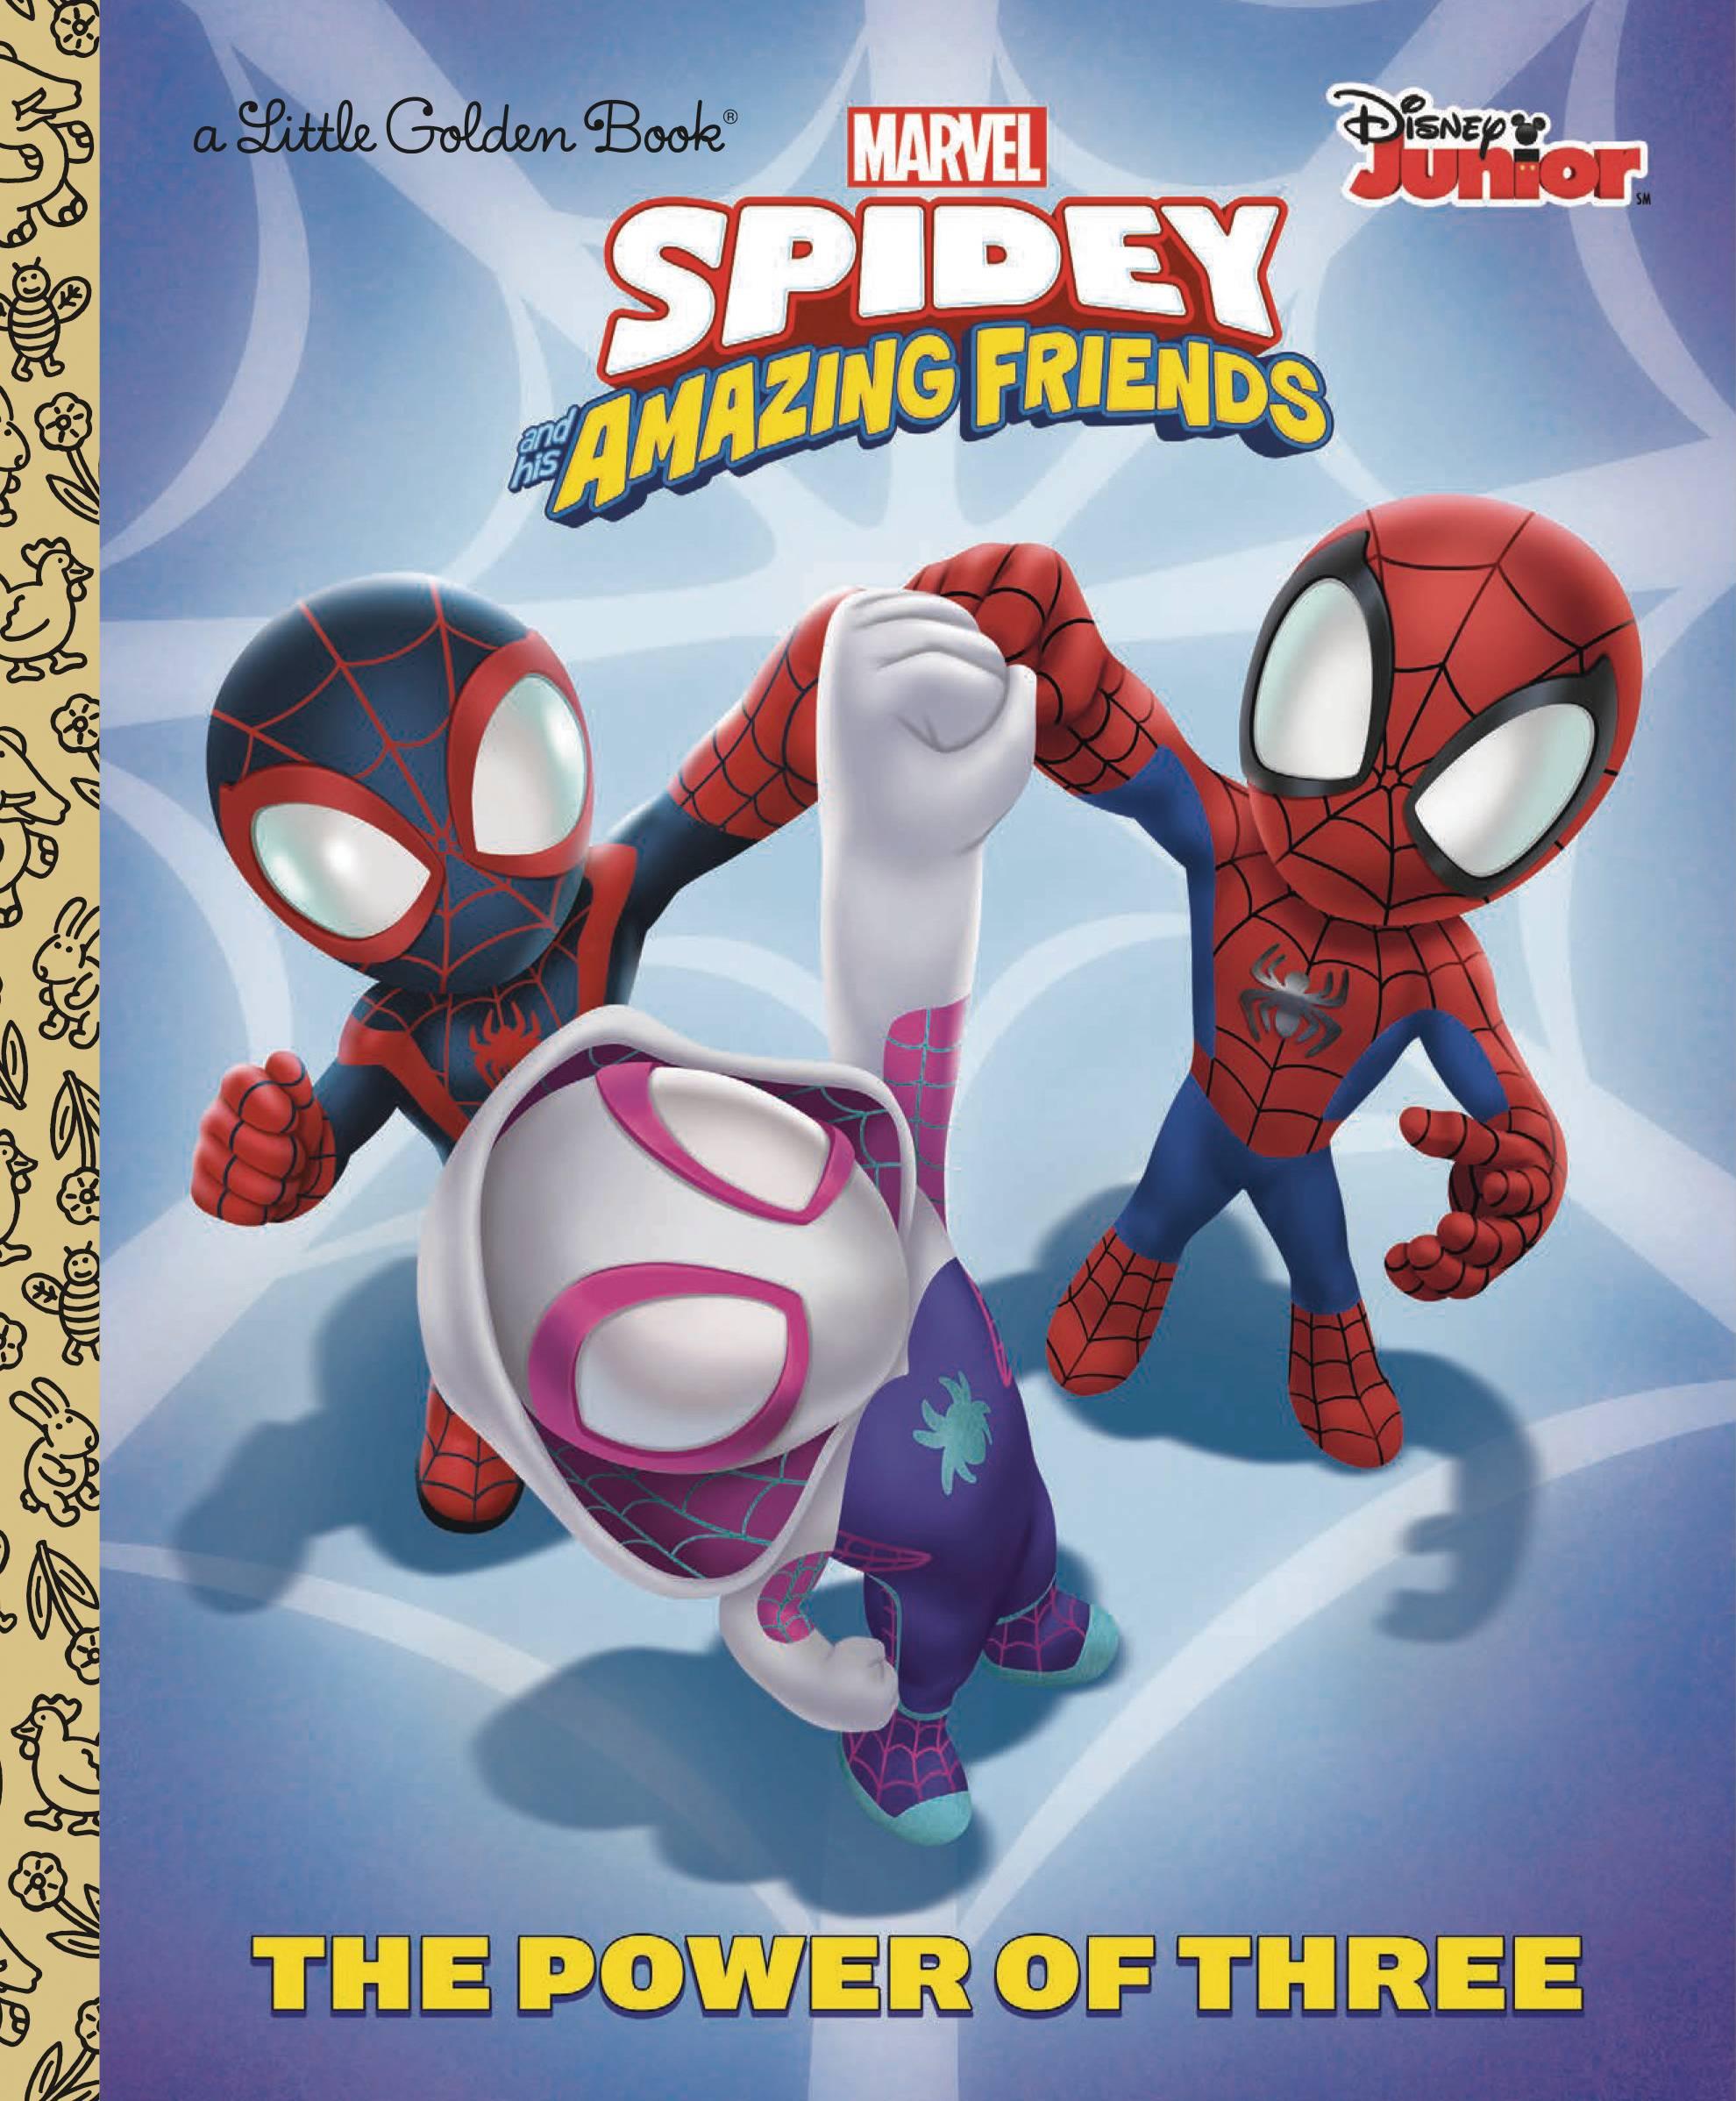 SPIDER-MAN & HIS AMAZING FRIENDS POWER OF 3 GOLDEN BOOK